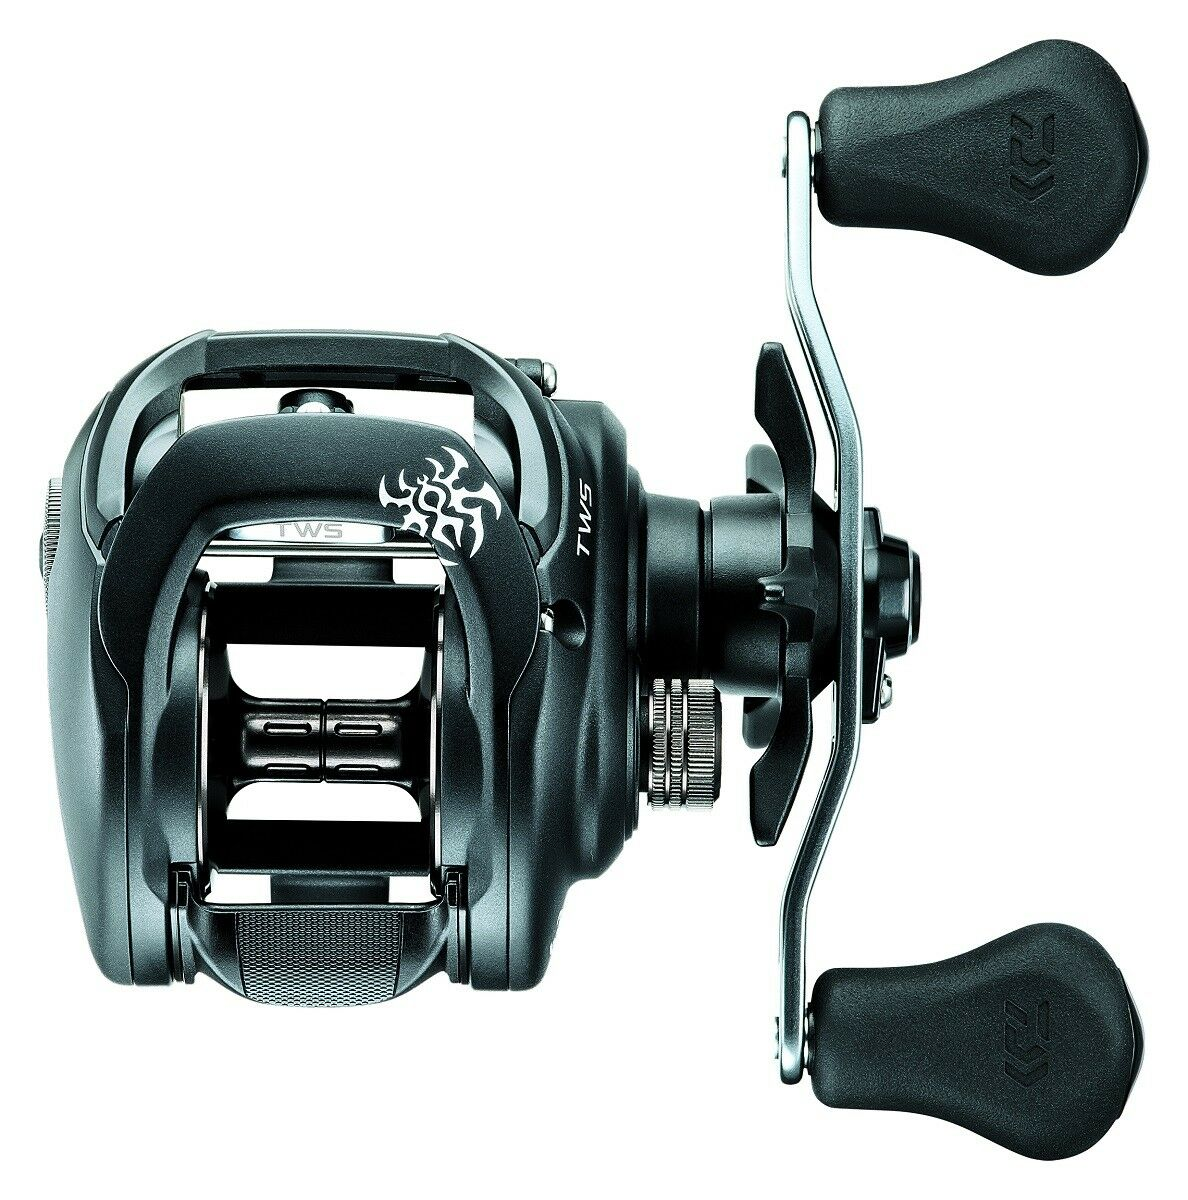 Daiwa Fishing Tatula 200 Series Bait Casting Fishing Daiwa Reel (Choose Model) a5041f